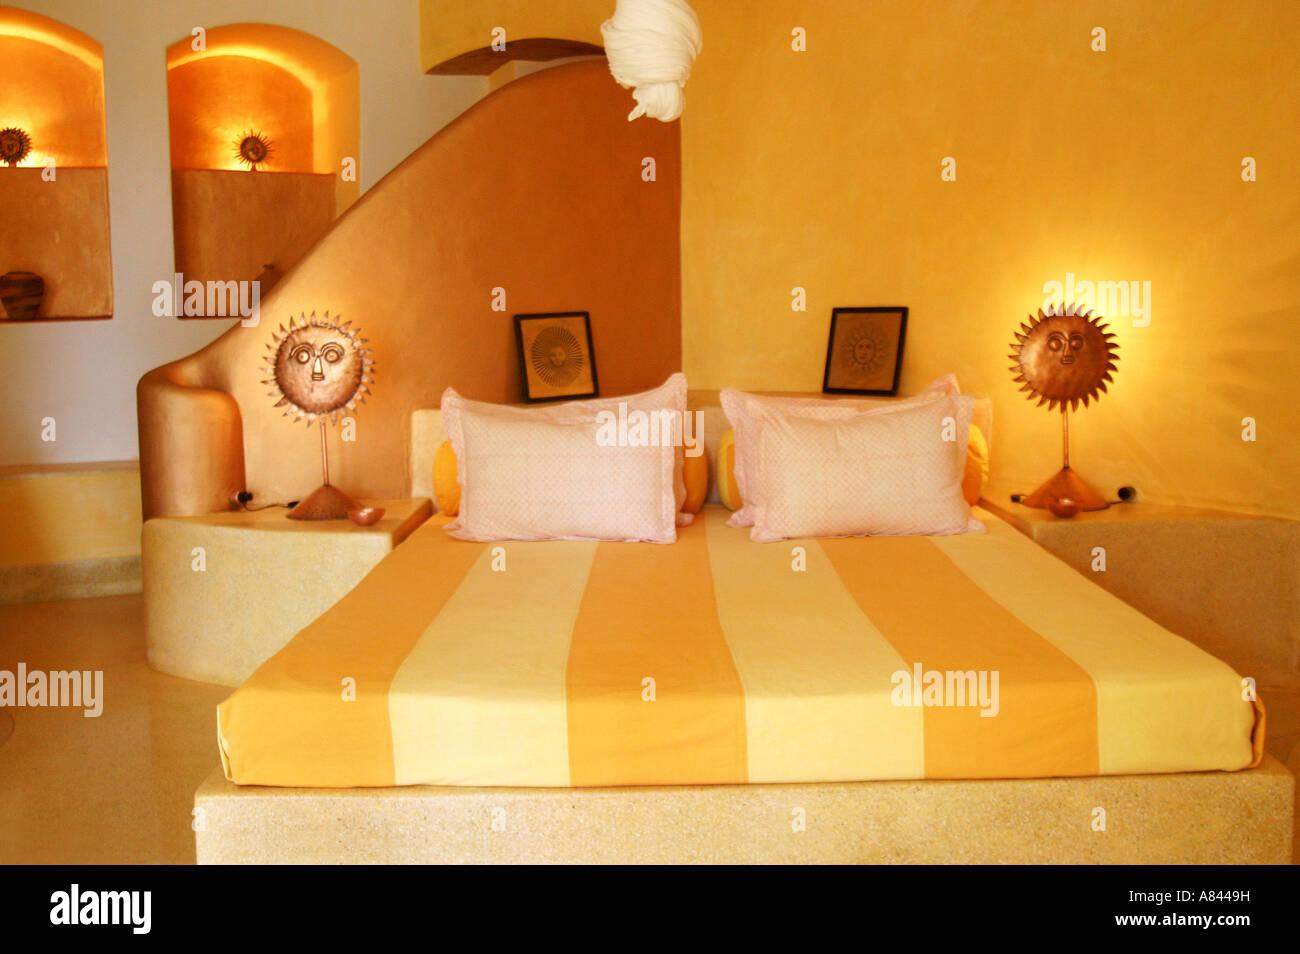 Spettacolare SUN bedroom suite designer Nilaya Hermitage boutique hotel in Goa in India Immagini Stock